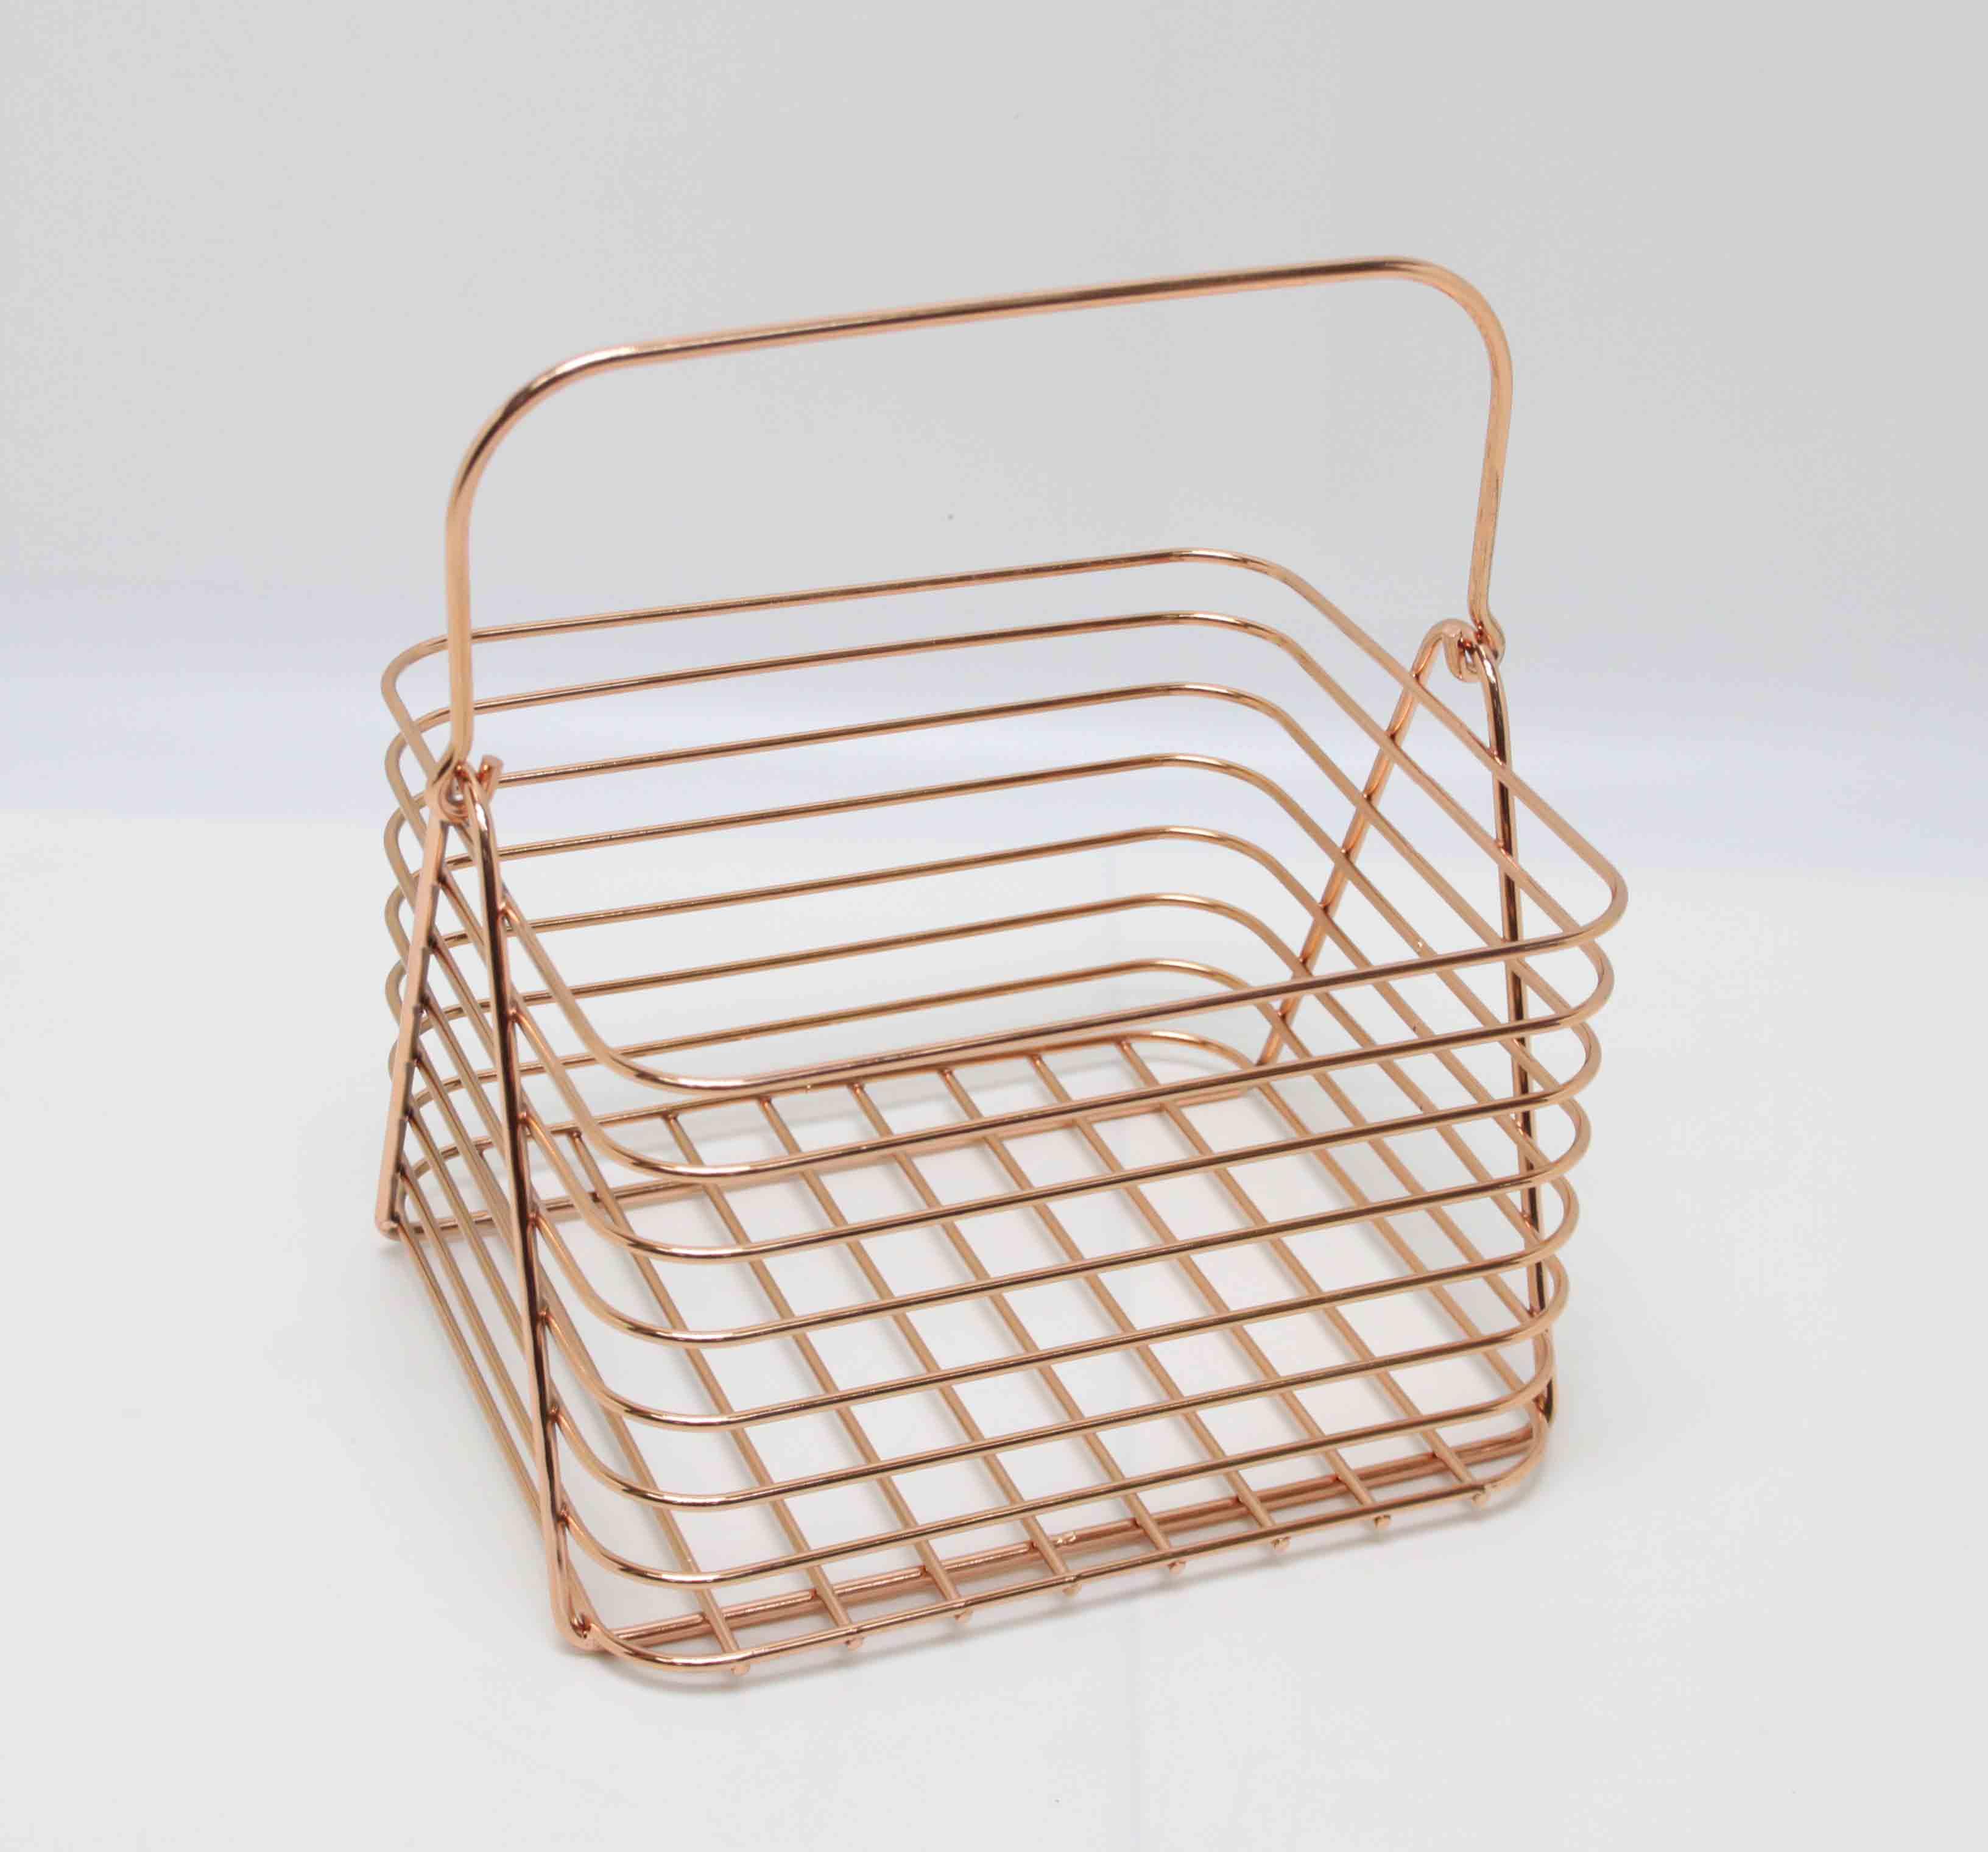 Kitchen Basket Pantry Basket Bath Basket Bread Wire Basket